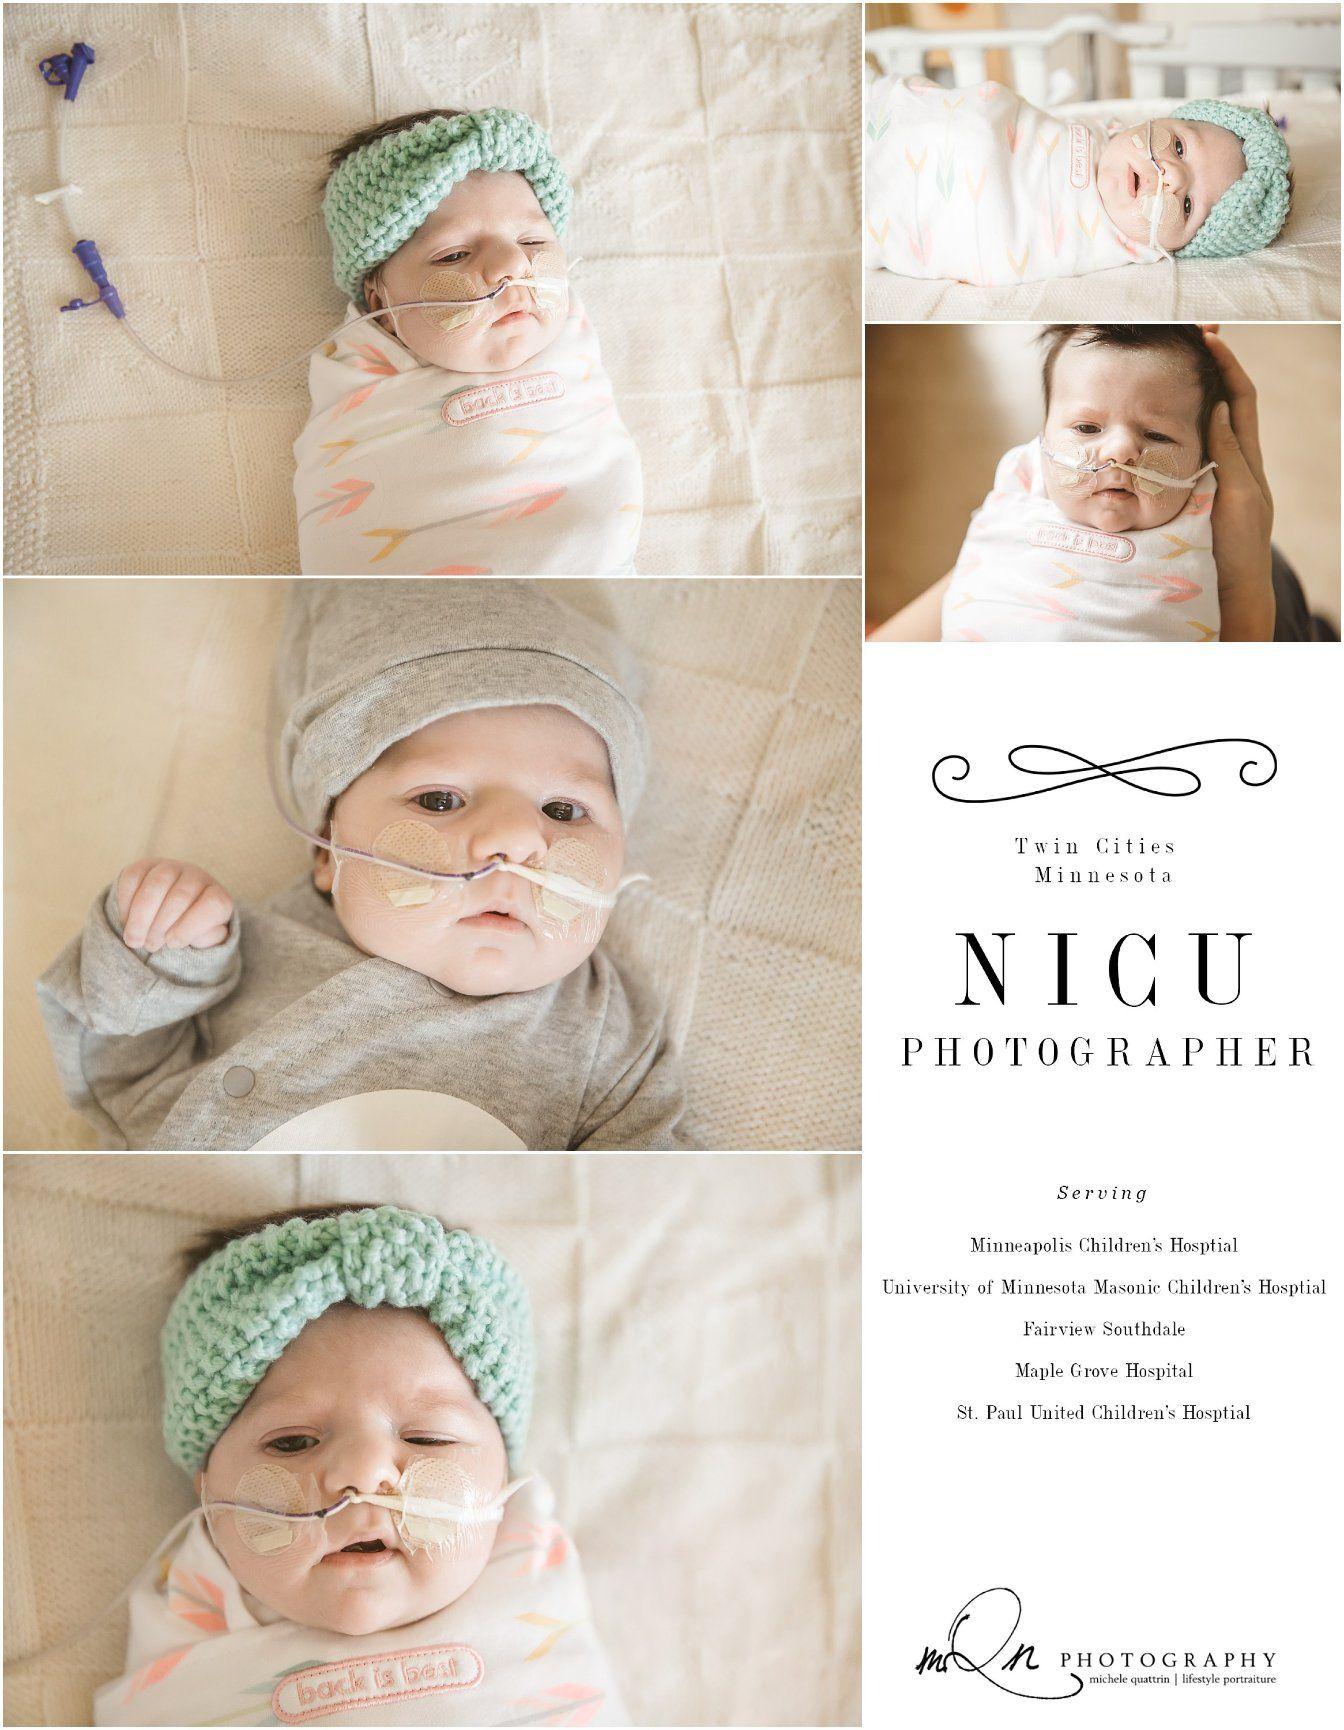 Nicu Photography Session Minneapolis Fresh 48 Photographer Lifestyle Photographer Mqn Photography Nicu Twin Cities Minnesota Welcome Home Baby